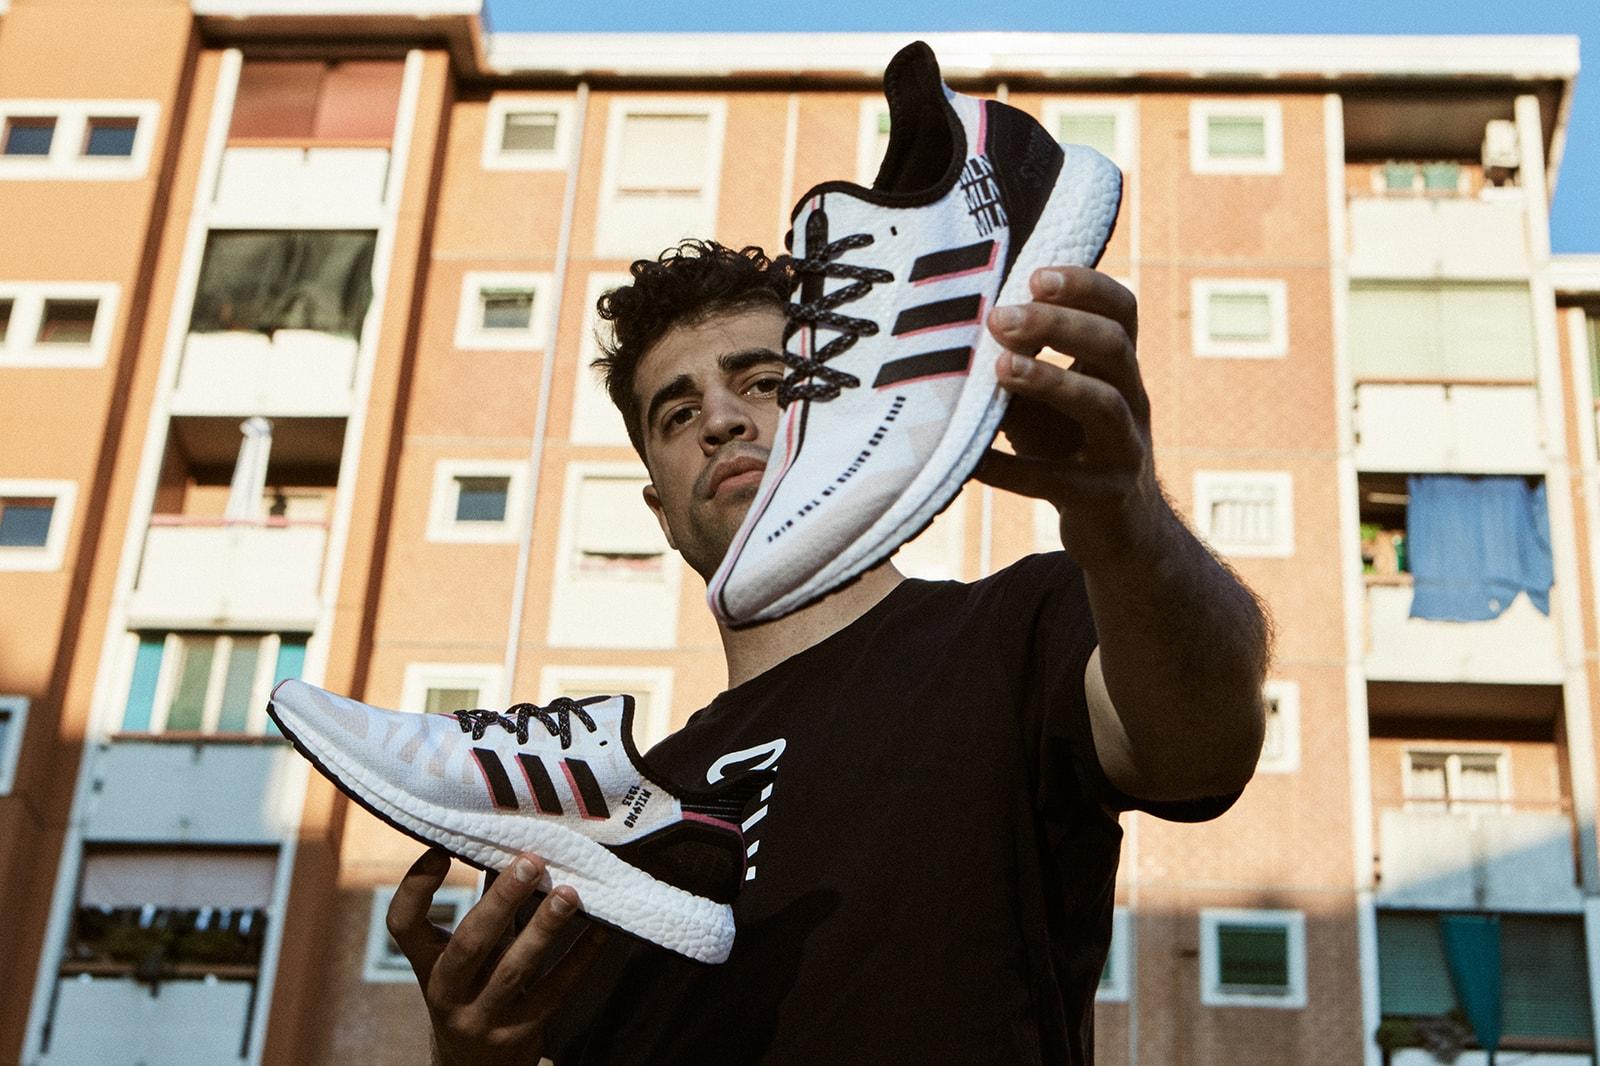 adidas and Foot Locker SPEEDFACTORY Milan AM4 sneaker Otln Studio